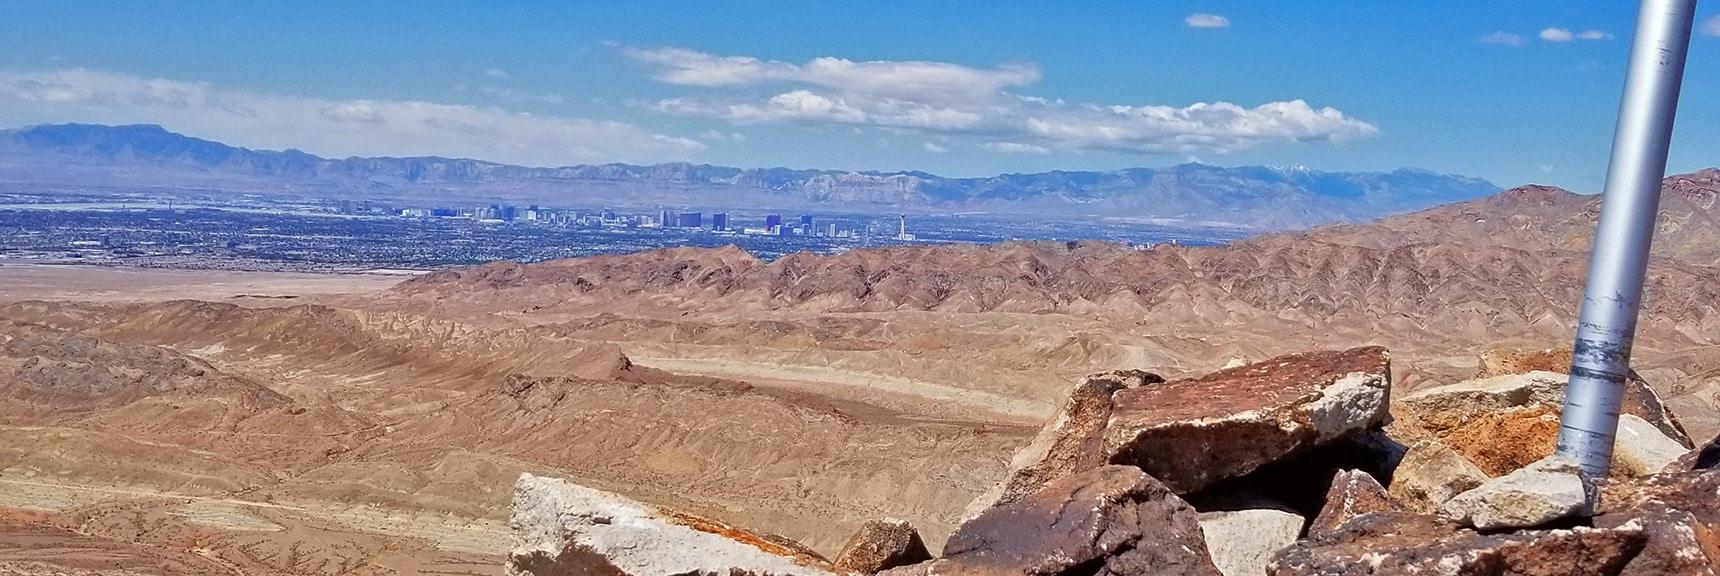 Las Vegas Strip, Potosi Mt., Rainbow Mts., La Madre Mts., Charleston Wilderness from Summit | Lava Butte | Lake Mead National Recreation Area, Nevada